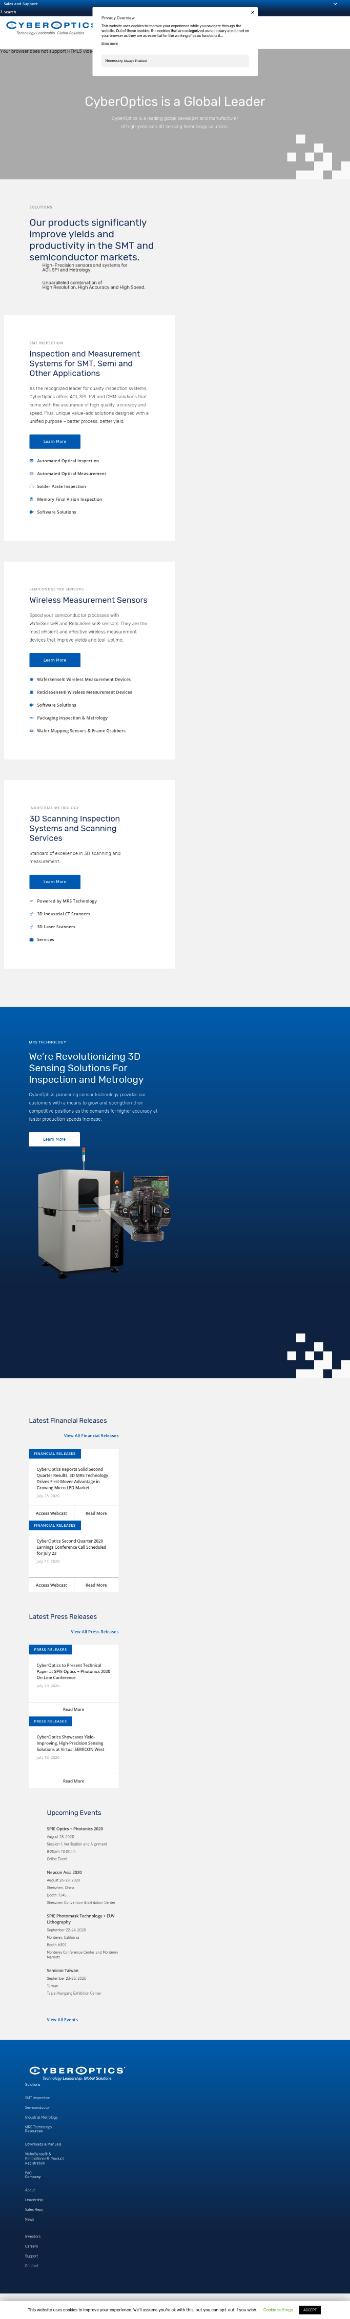 CyberOptics Corporation Website Screenshot